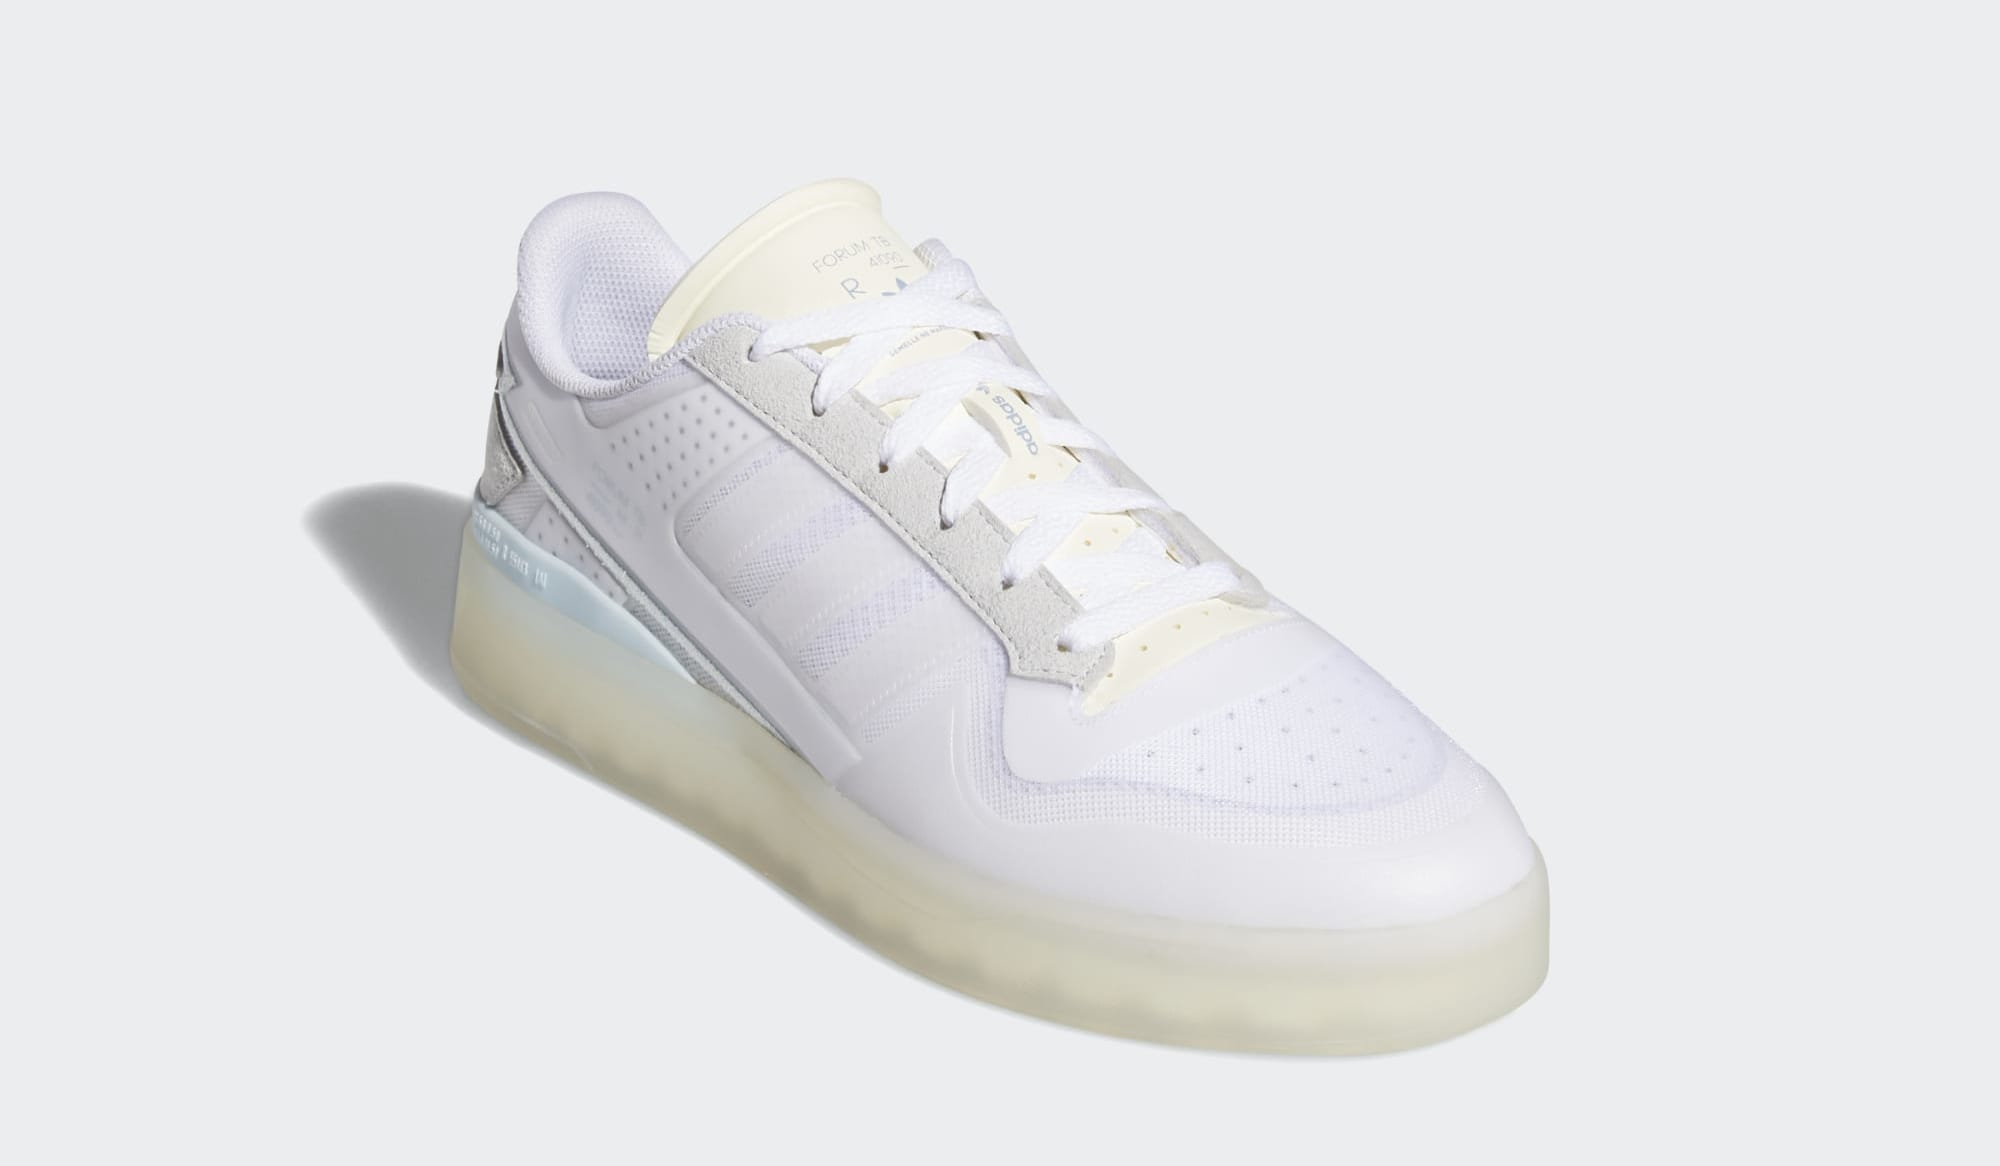 Adidas Forum Low Tech Boost 'Cloud White' Q46357 Front